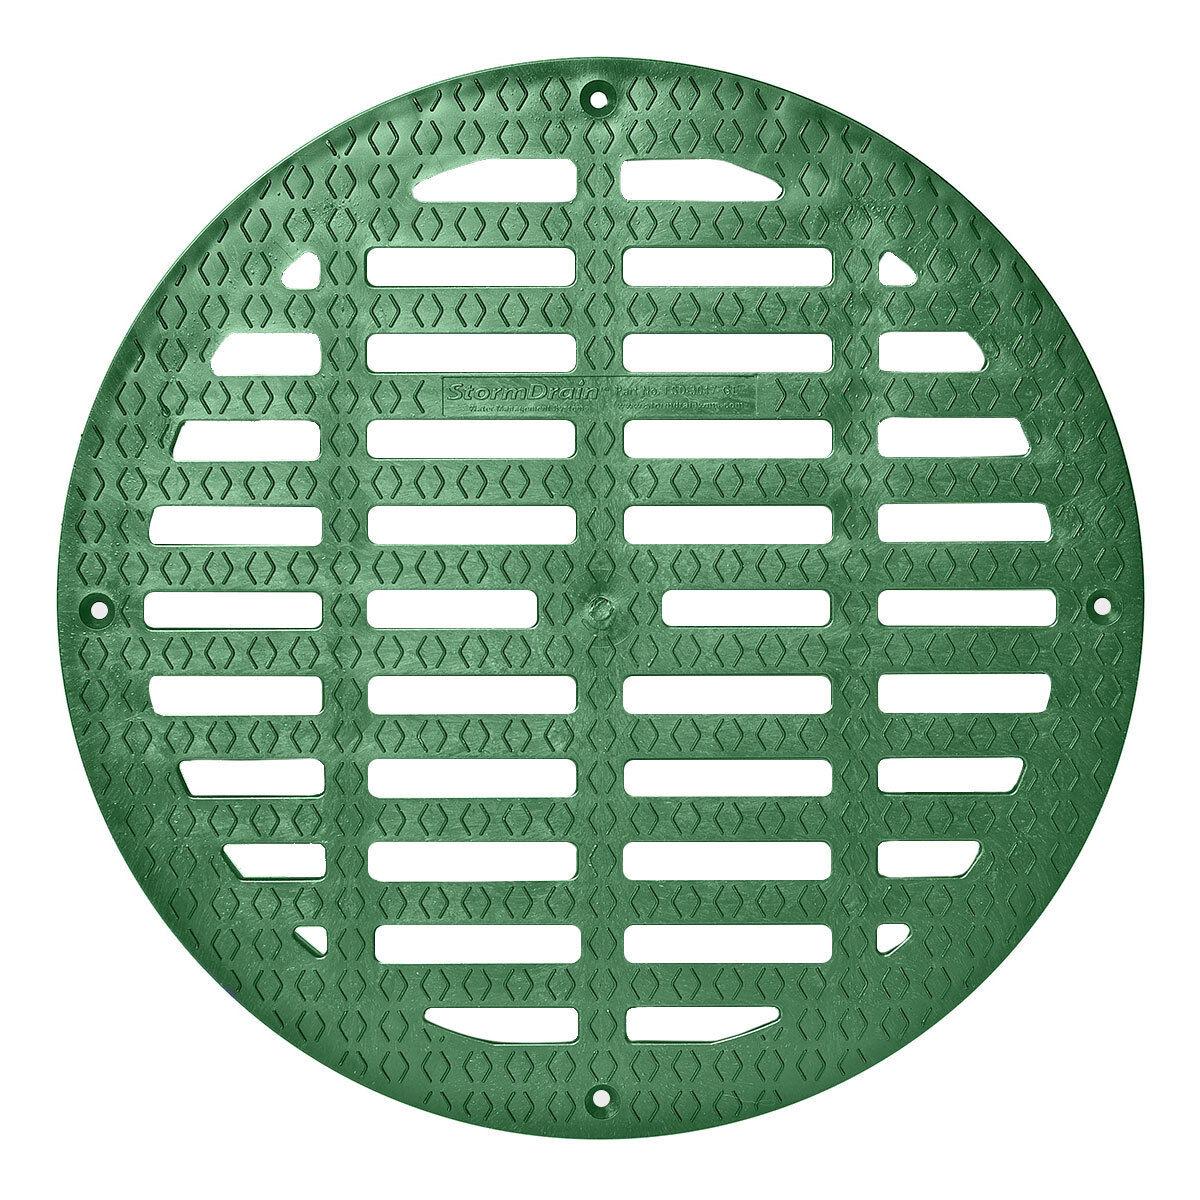 Storm Drain FSD-3017-G20G 20″ Round Flat Green Grate for Catch Basin Bath